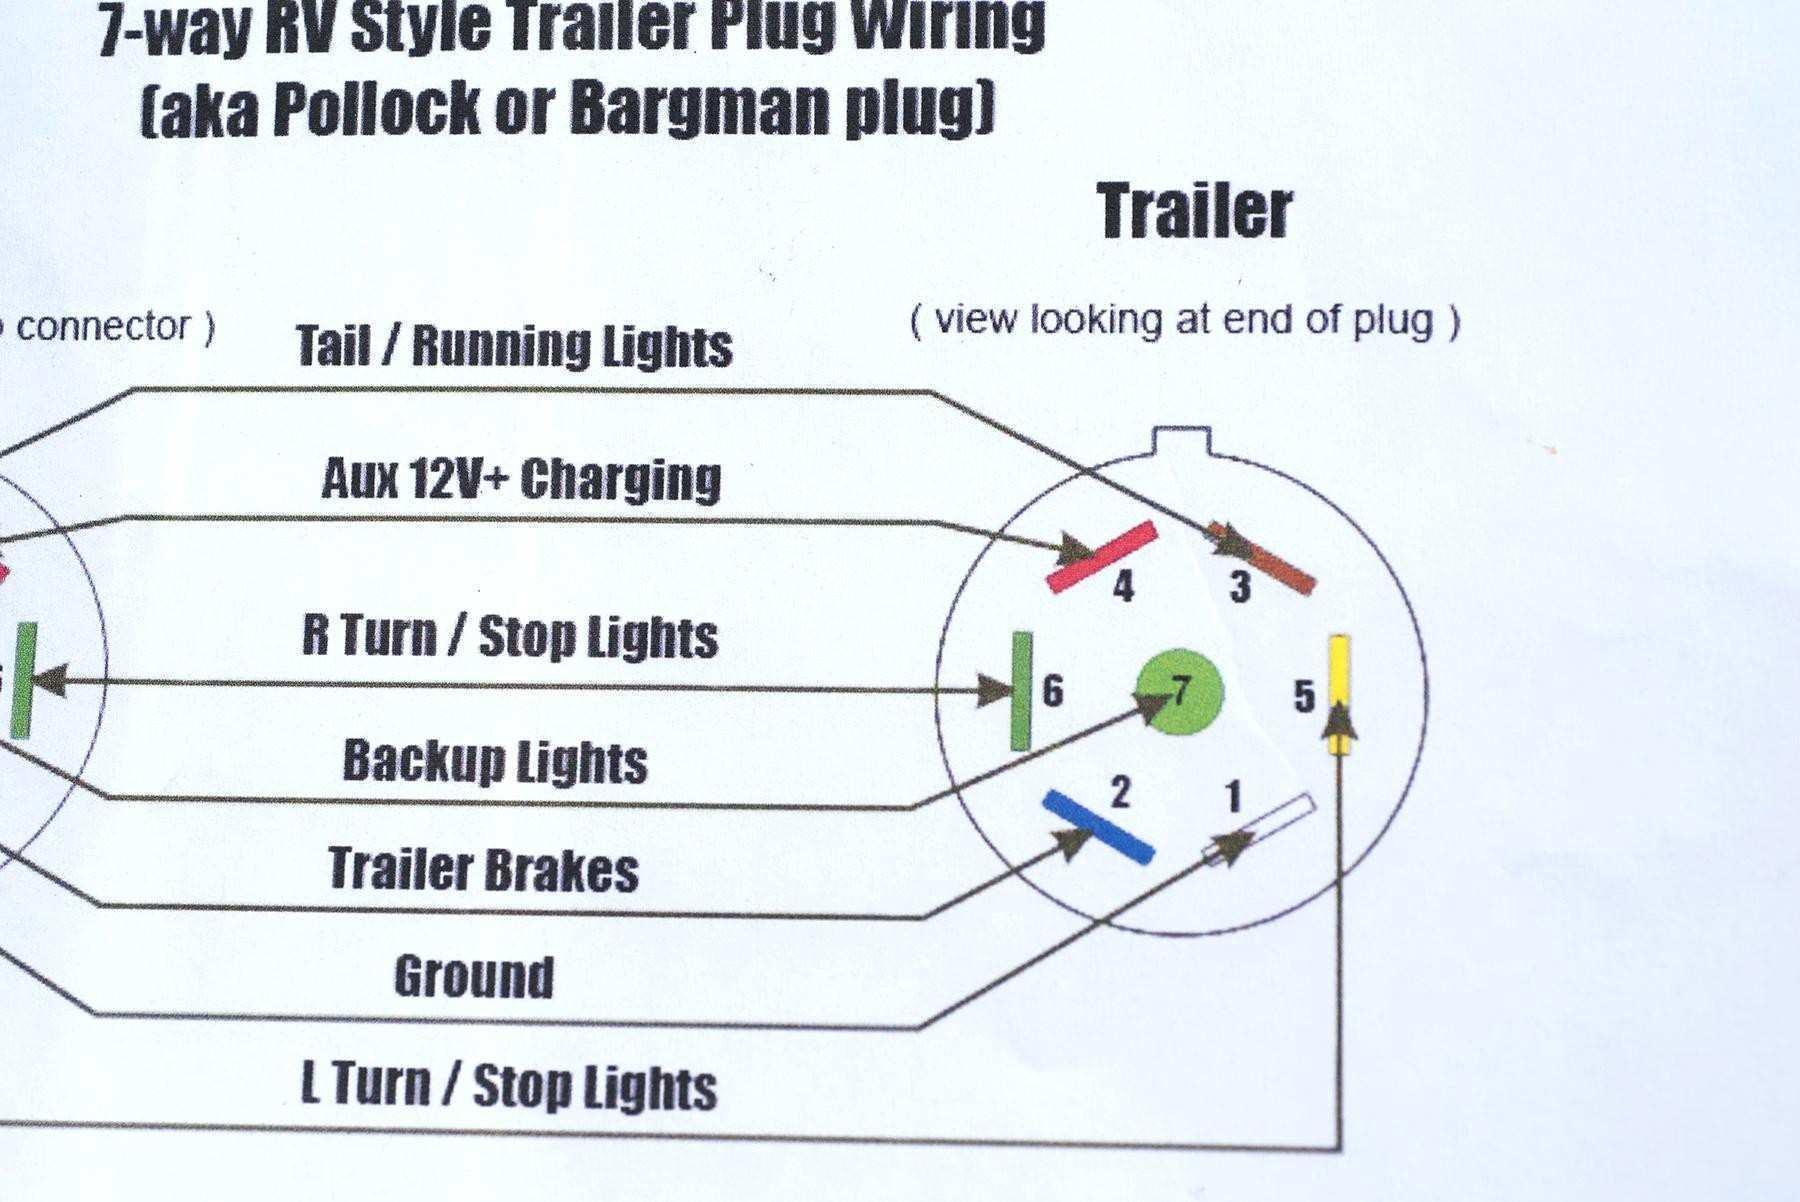 4 Way Trailer Wiring Diagram Ford | Wiring Diagram - Ford Trailer Wiring Diagram 7 Way